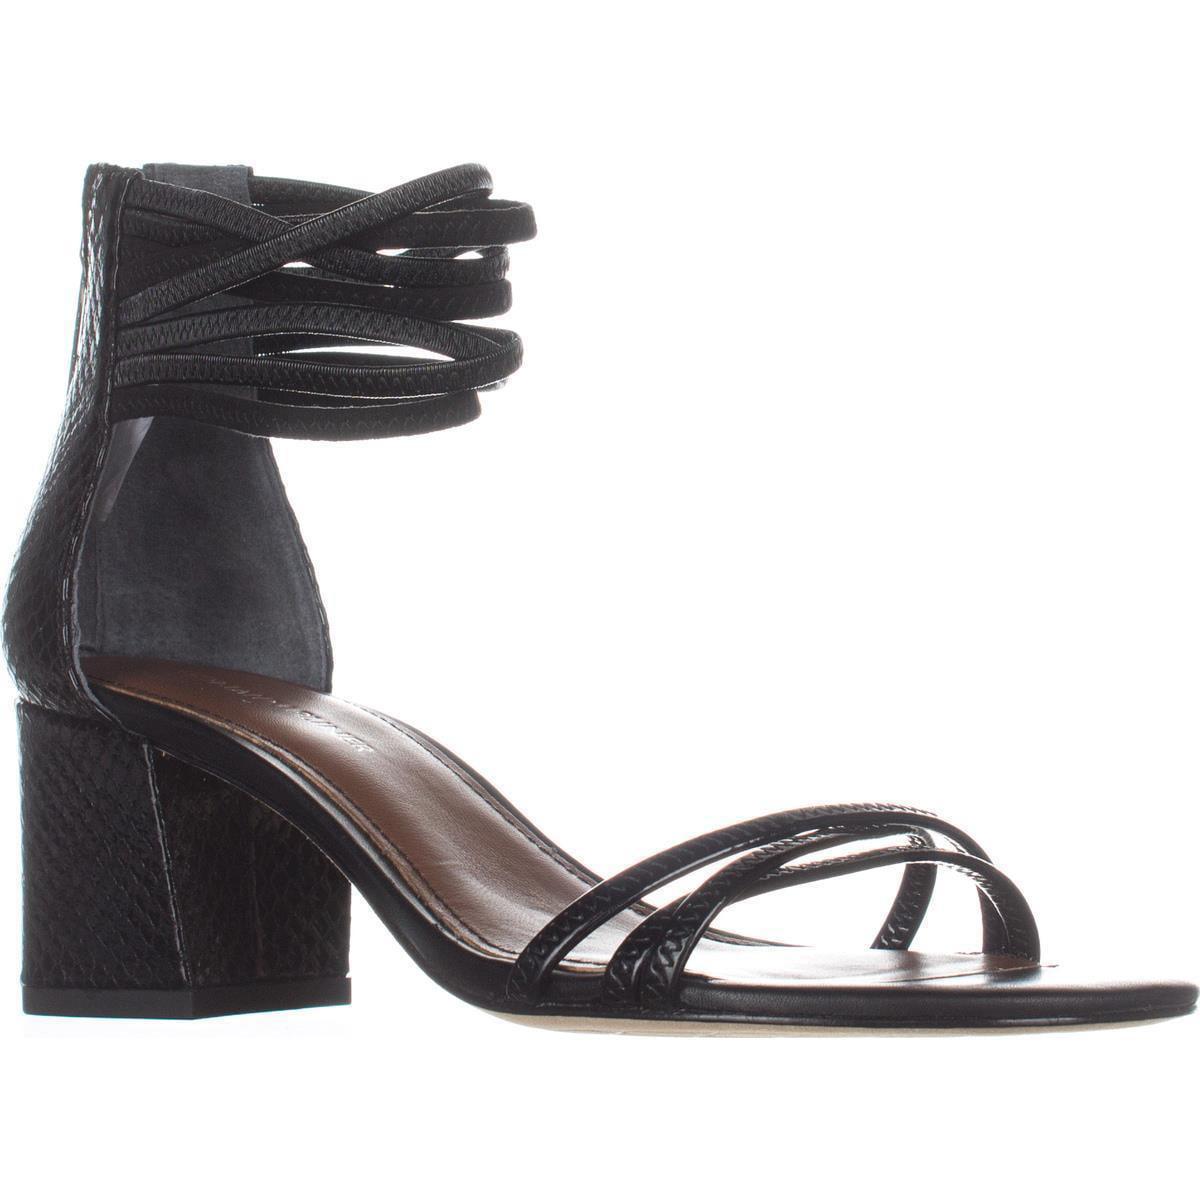 Womens Donald J Pliner Essie Ankle Strap Dress Sandals, Black Black by Donald J Pliner